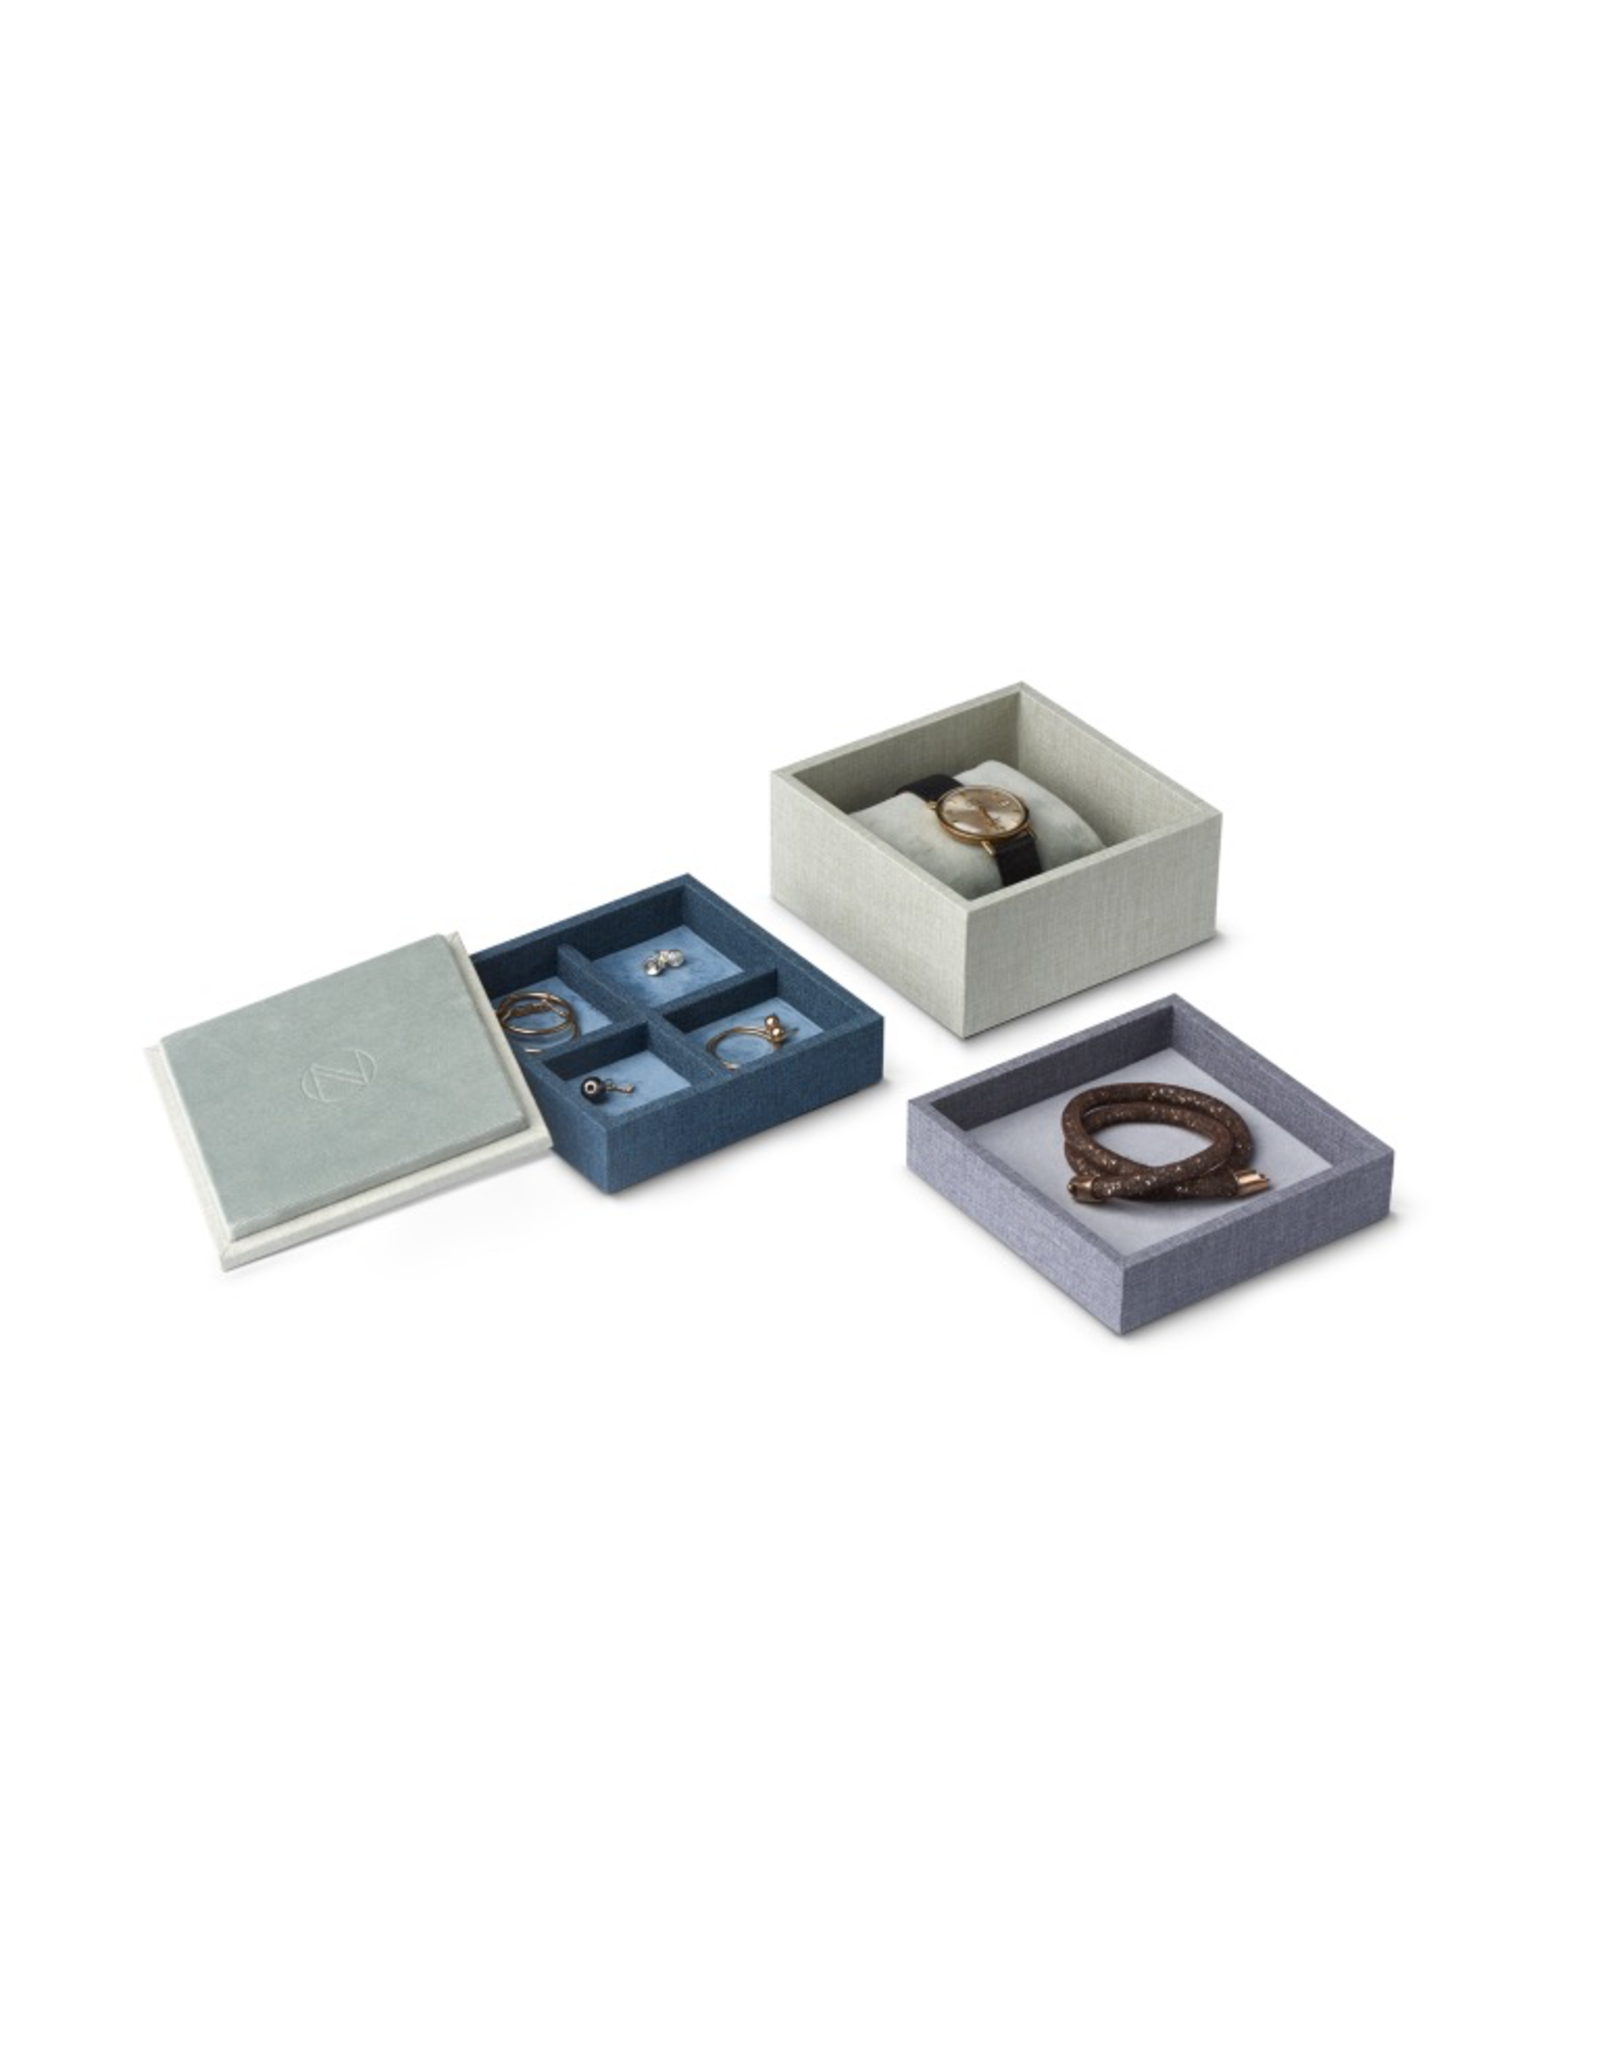 Juwelen STACK Jewellery Box Set S 3pcs set - Blue/Green/Grey